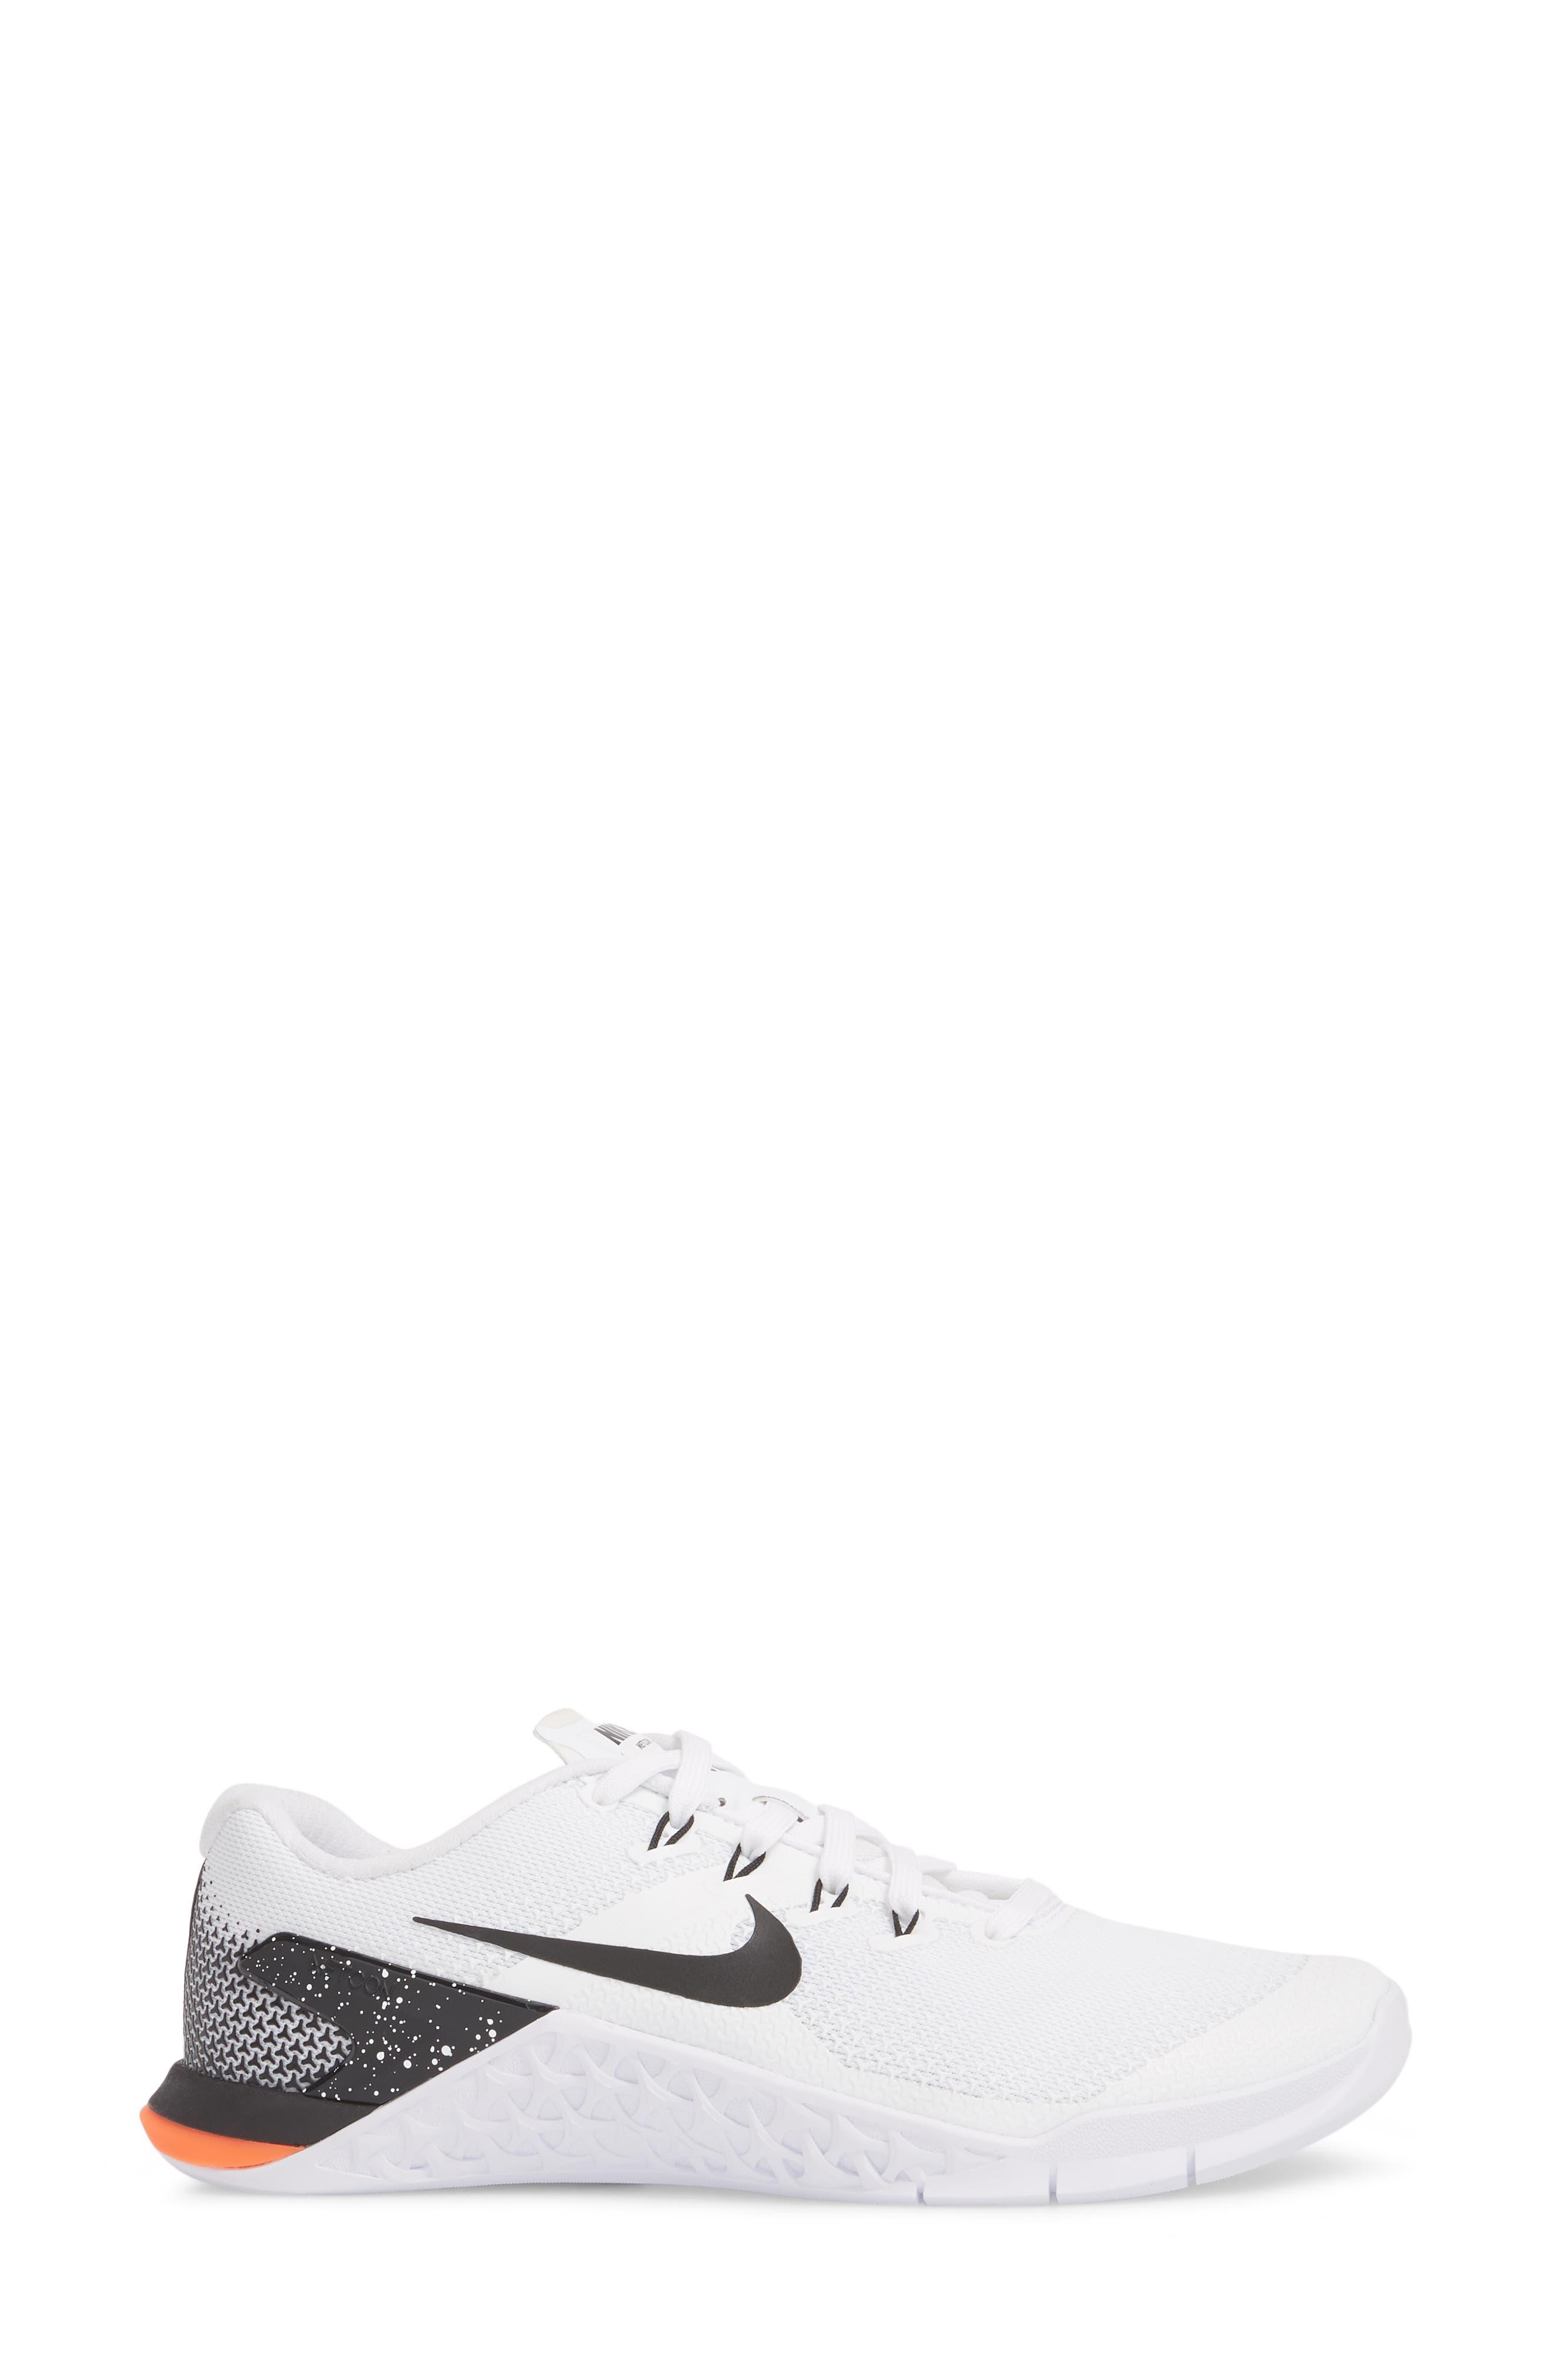 Metcon 4 Training Shoe,                             Alternate thumbnail 22, color,